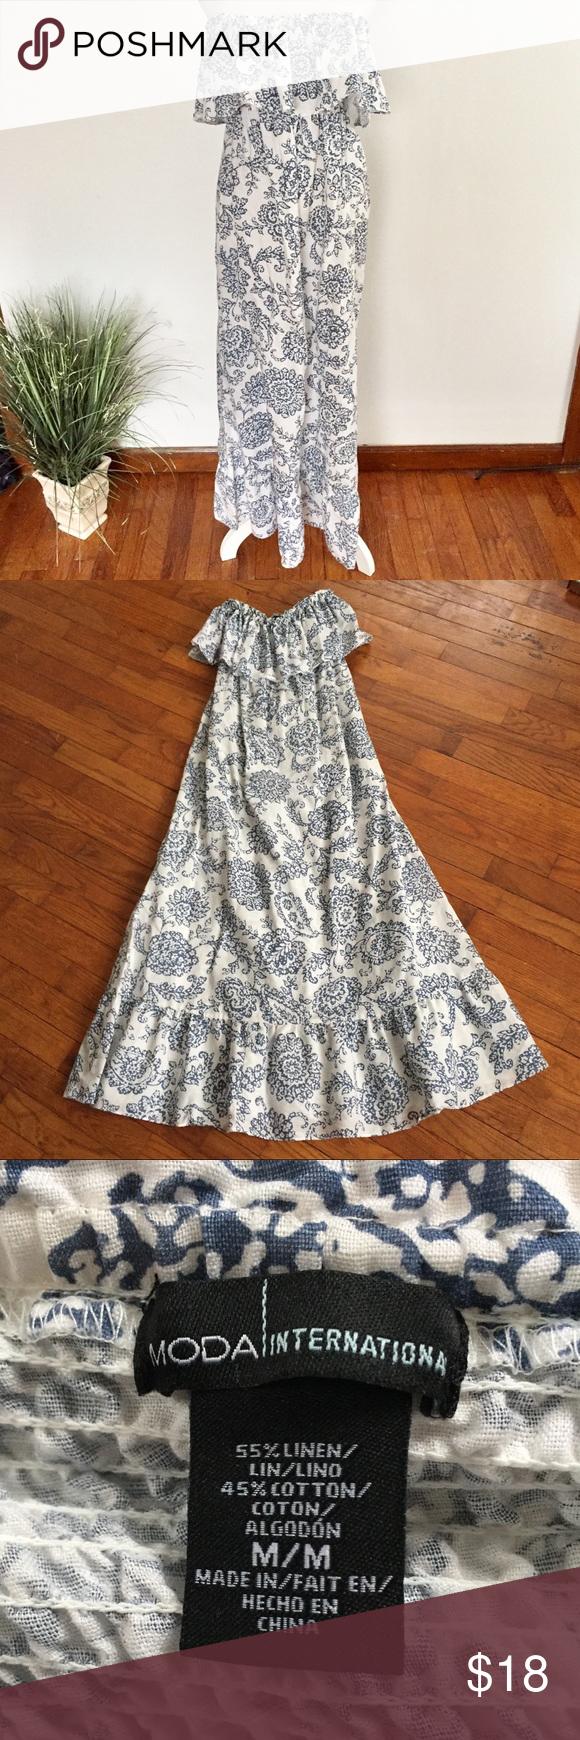 Victoria S Secret Strapless Ruffle Maxi Dress Ruffled Maxi Dress Dresses Maxi Dress [ 1740 x 580 Pixel ]